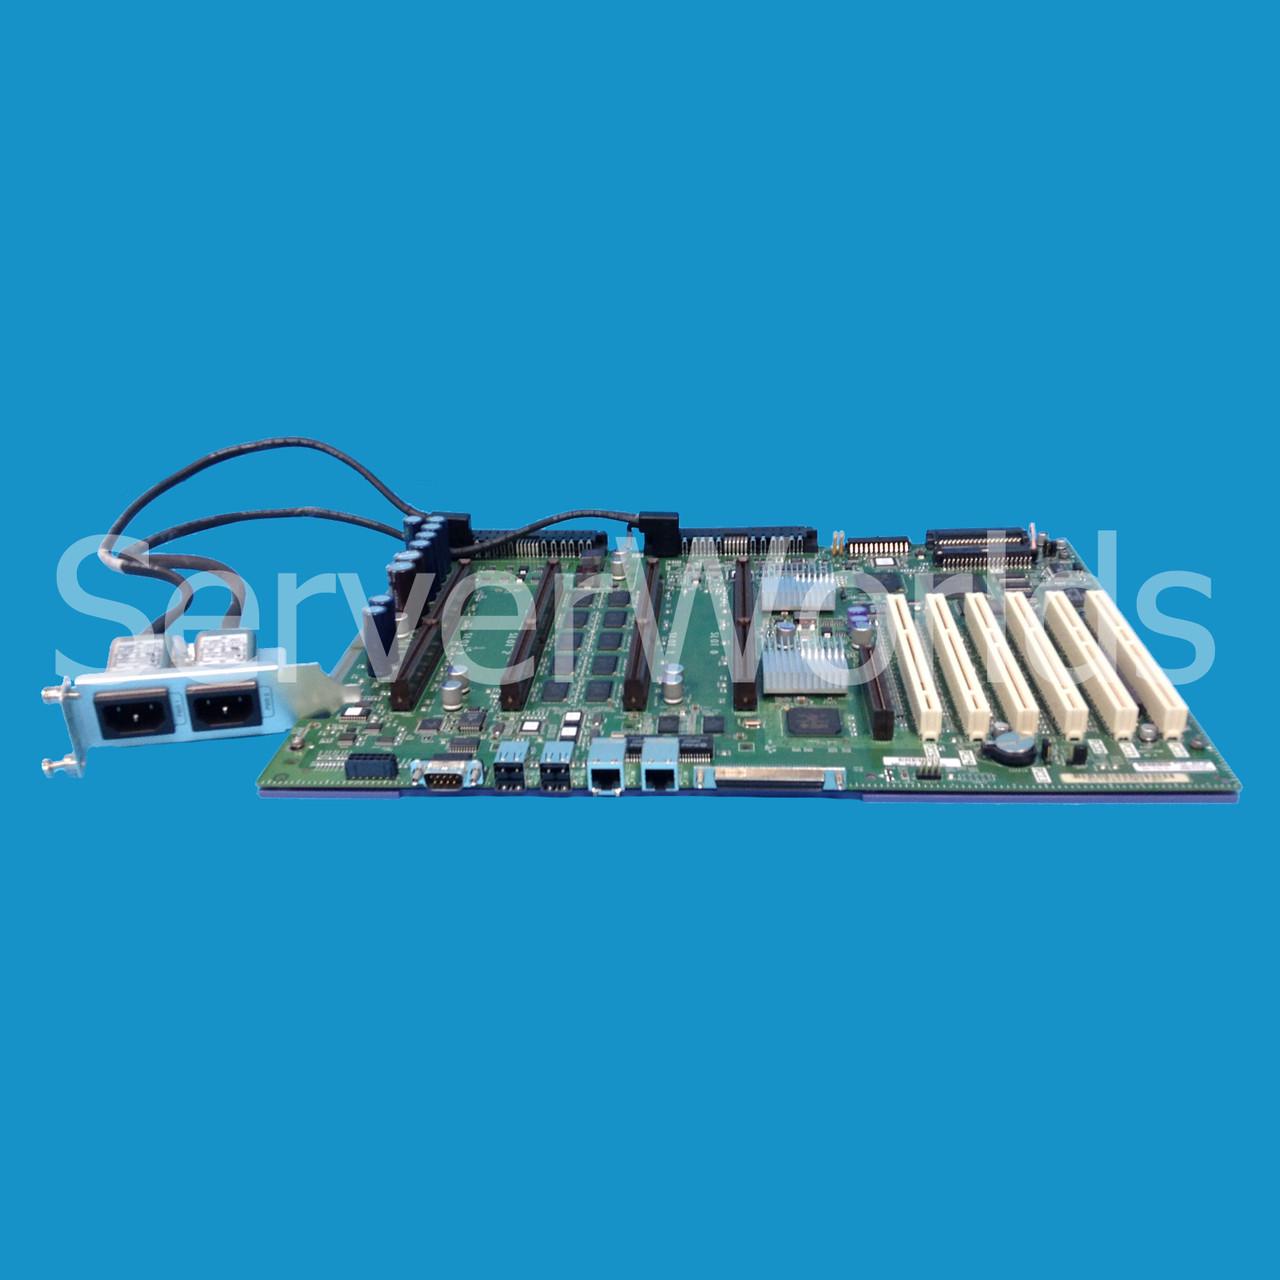 Sun 501-6344   SunFire V440 MotherBoard - Serverworlds